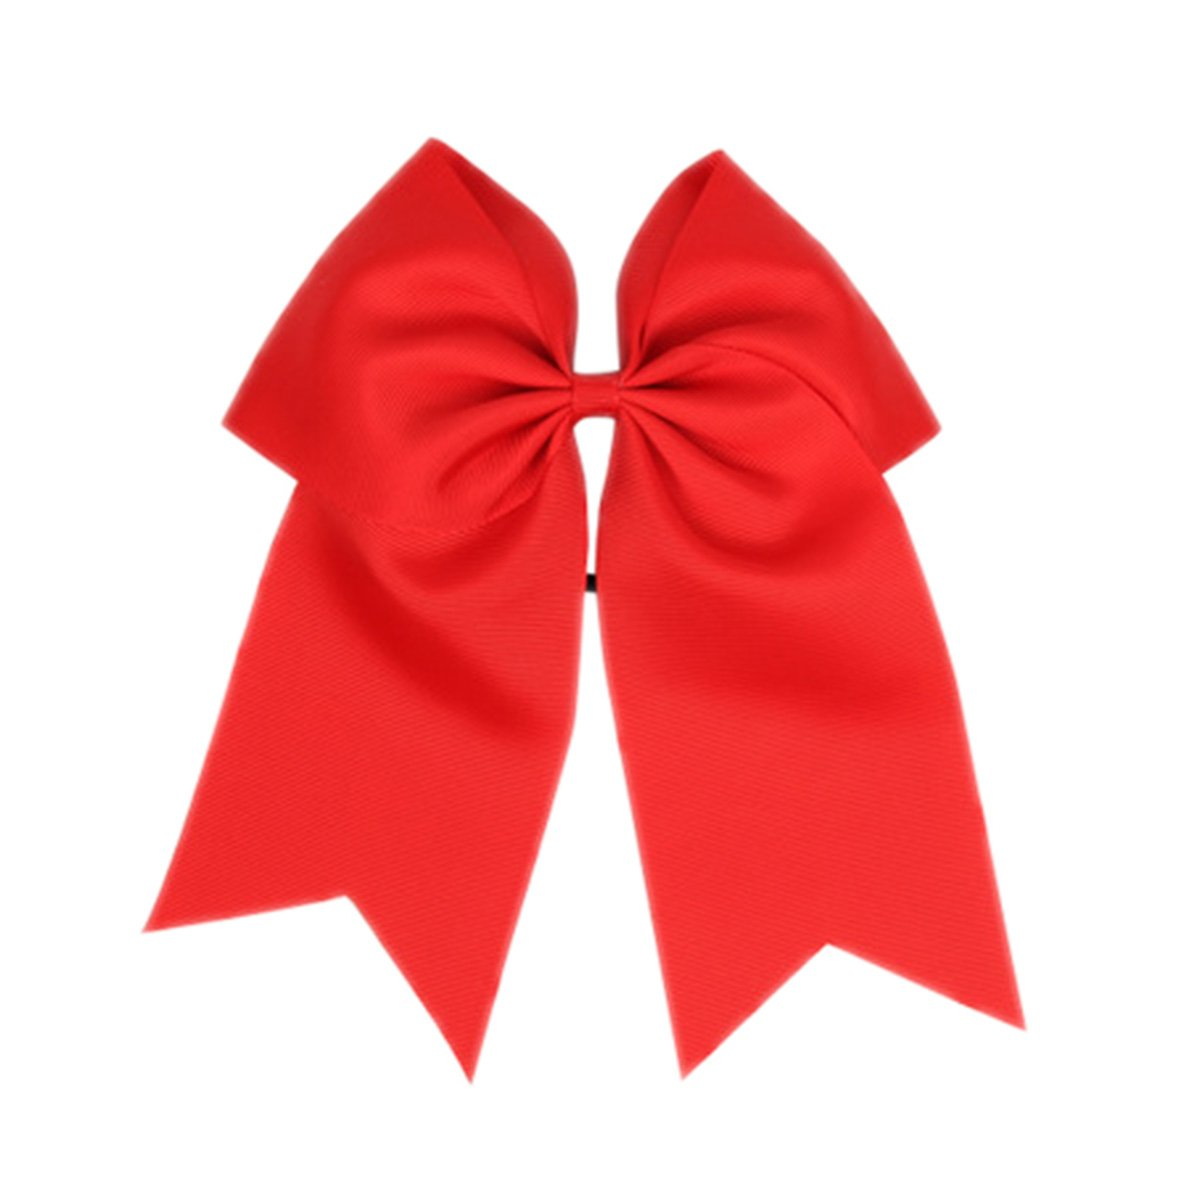 ZOONAI Women Teen Girls Large Classic Hair Accessories Big Hair Bow Ponytail Holder Hair Tie Navy